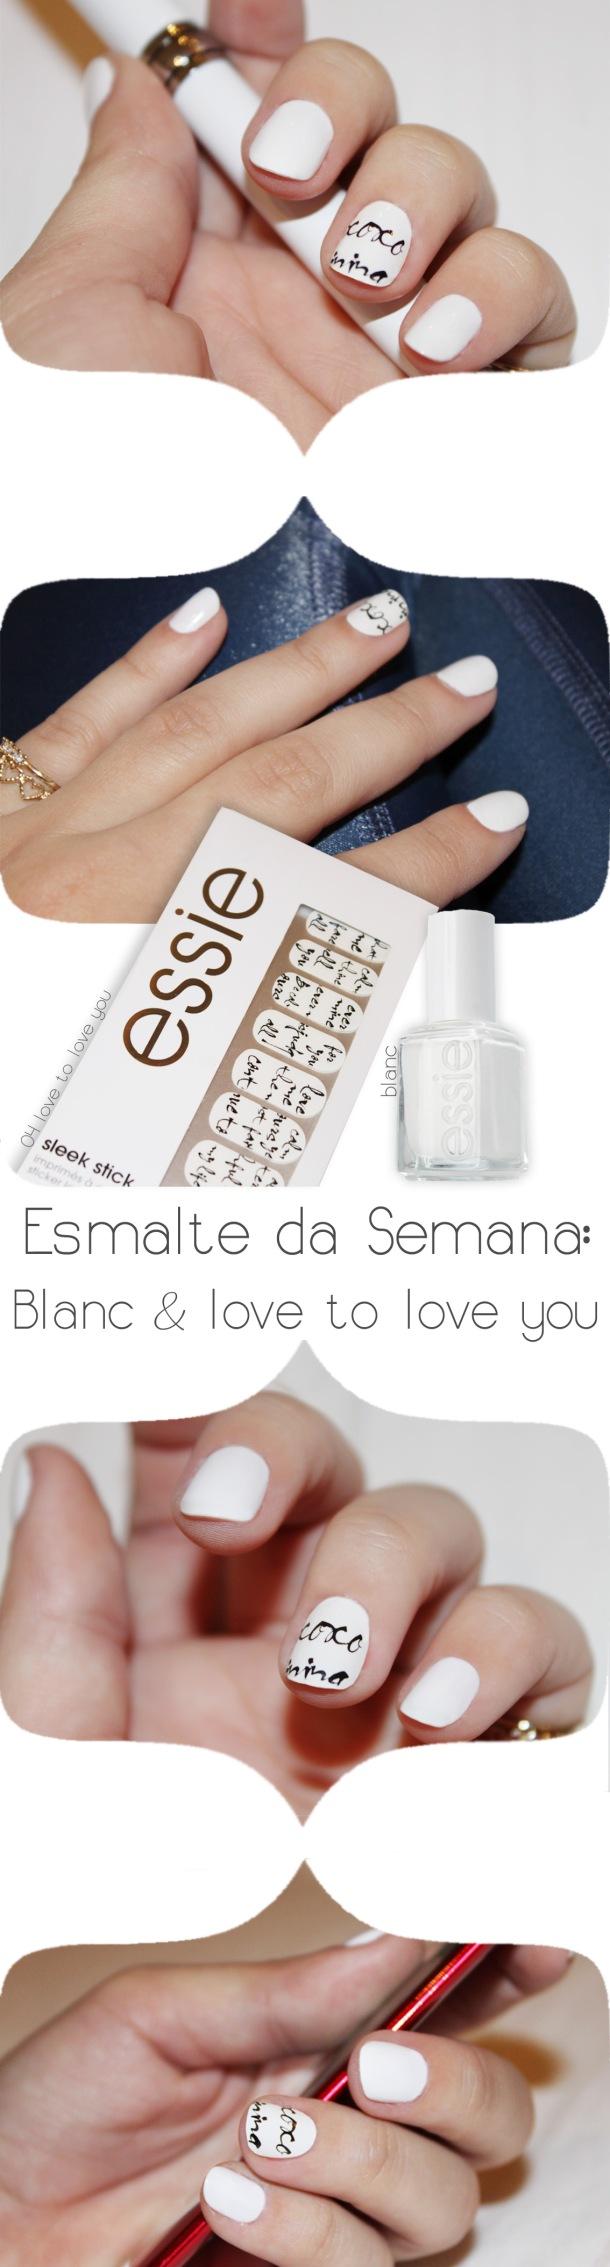 esmalte_semana_blanc_sticker